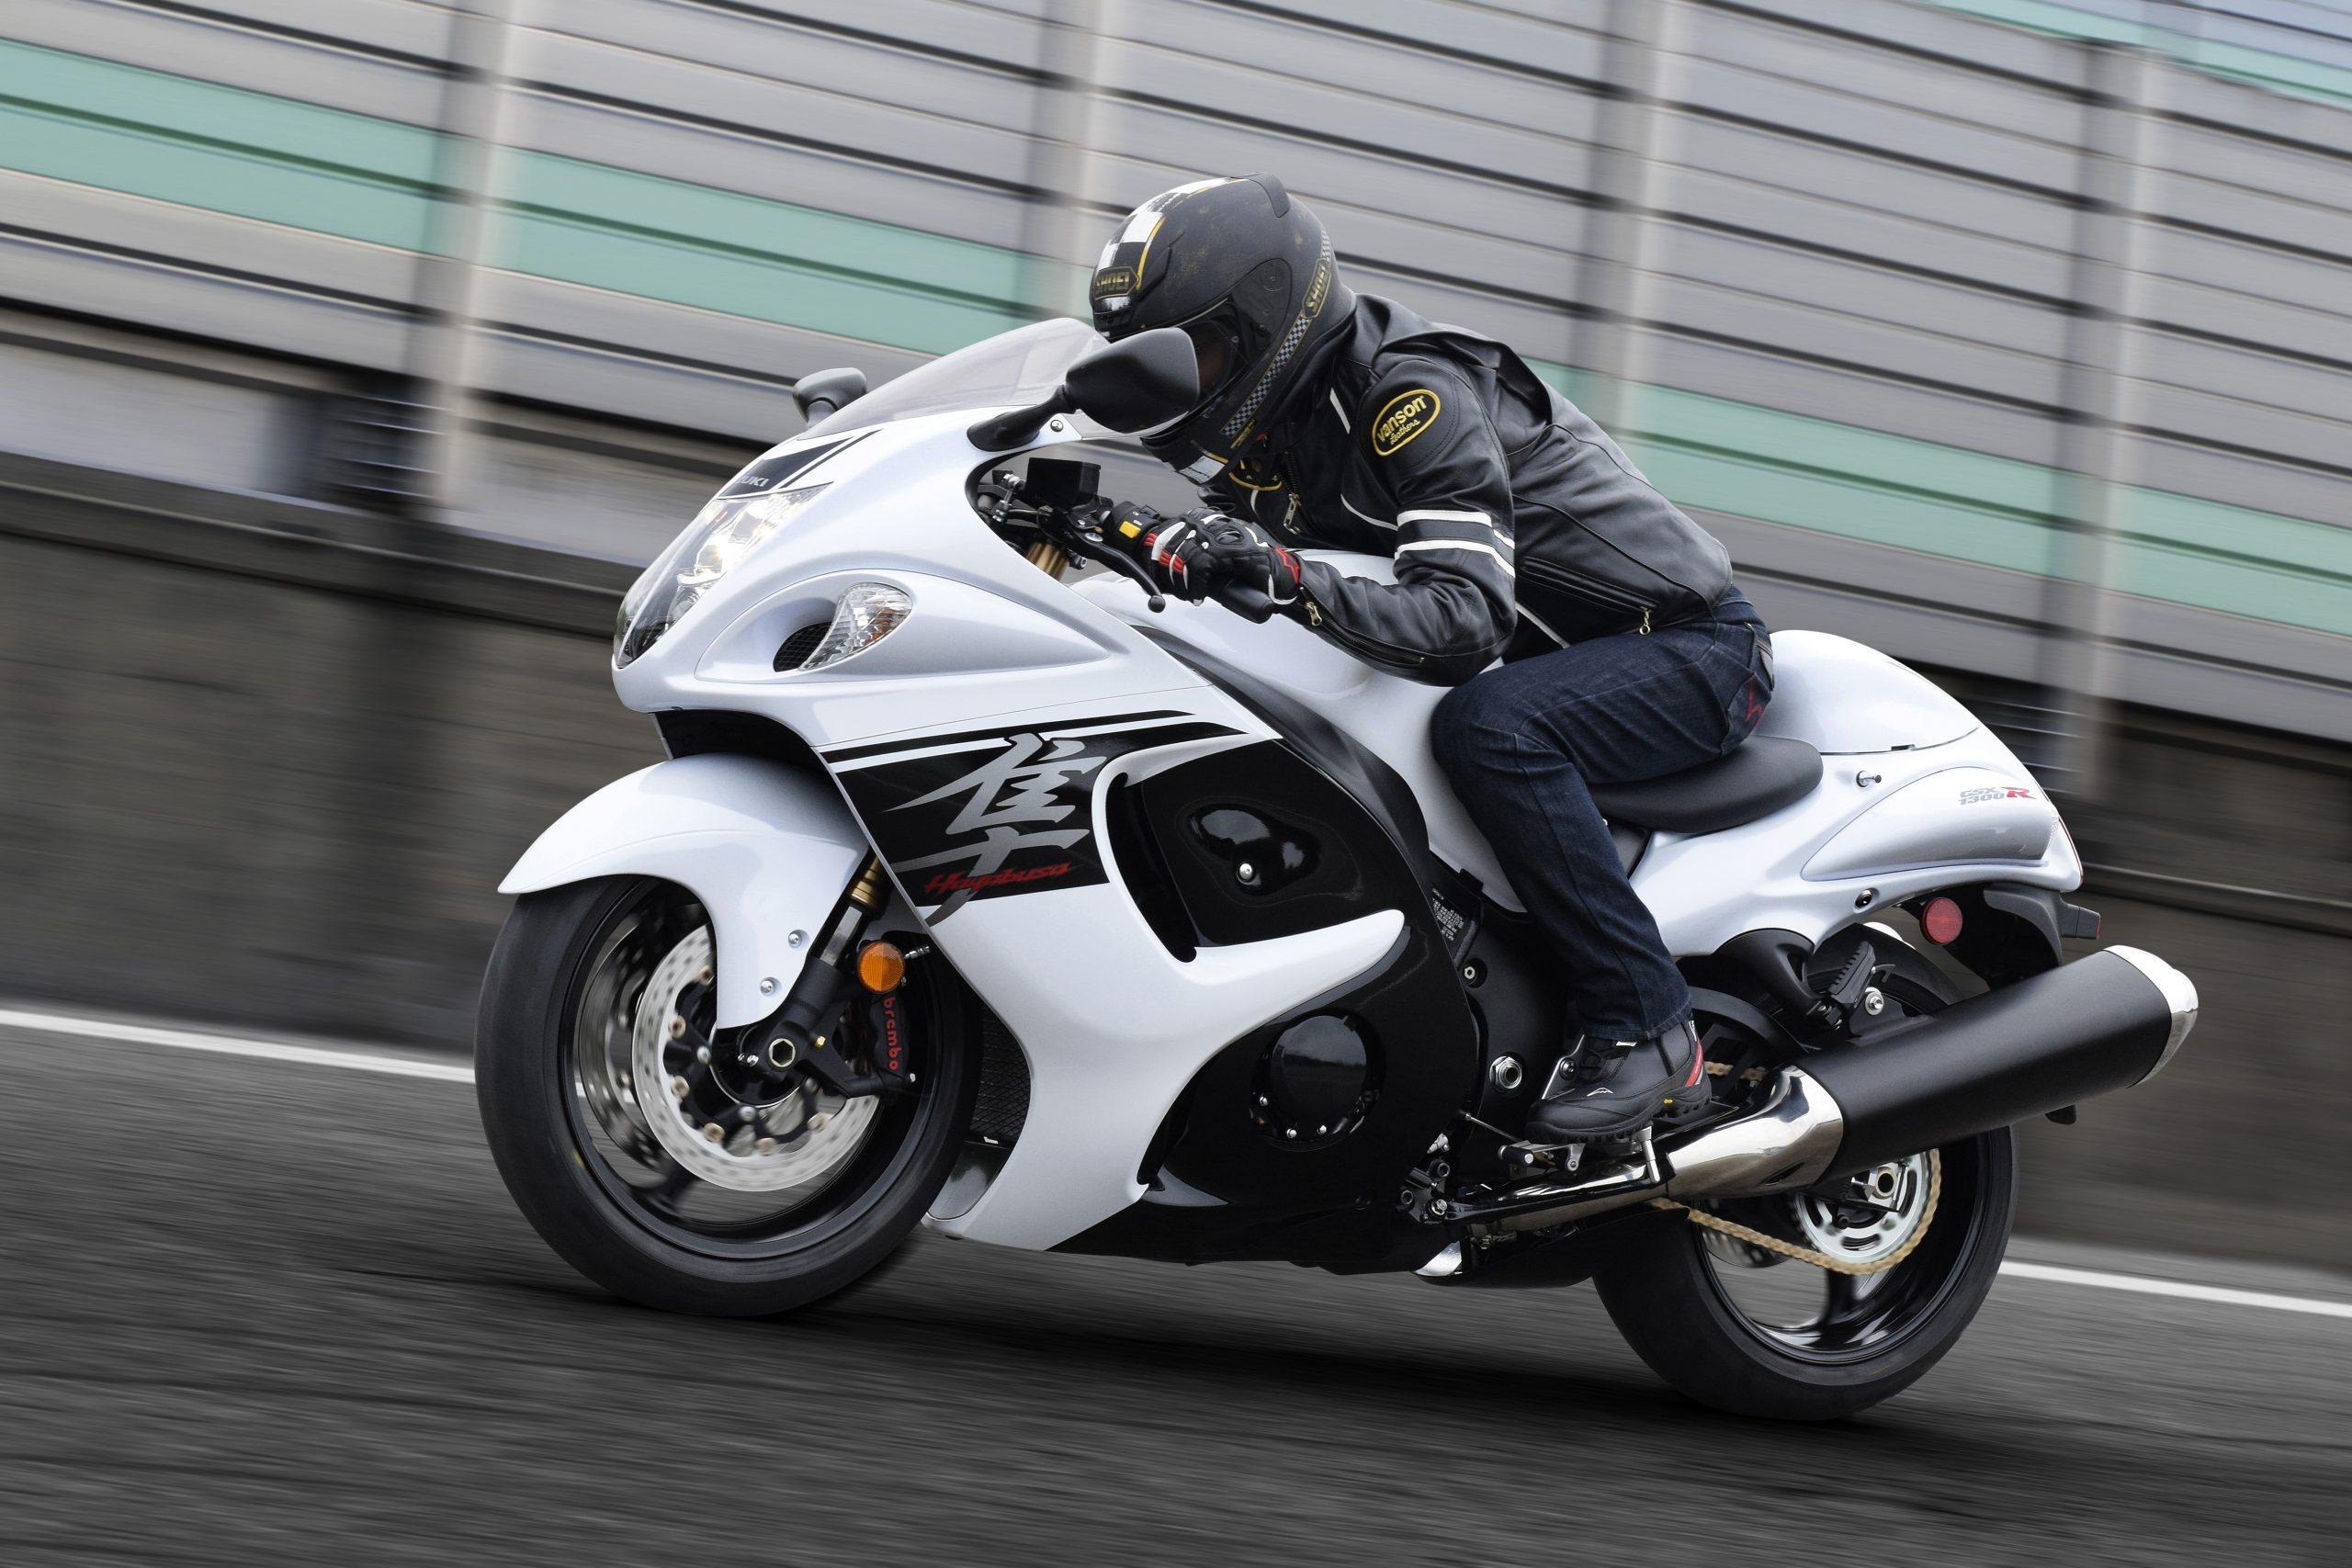 Motorbike types, hypersports, Suzuki Hayabusa